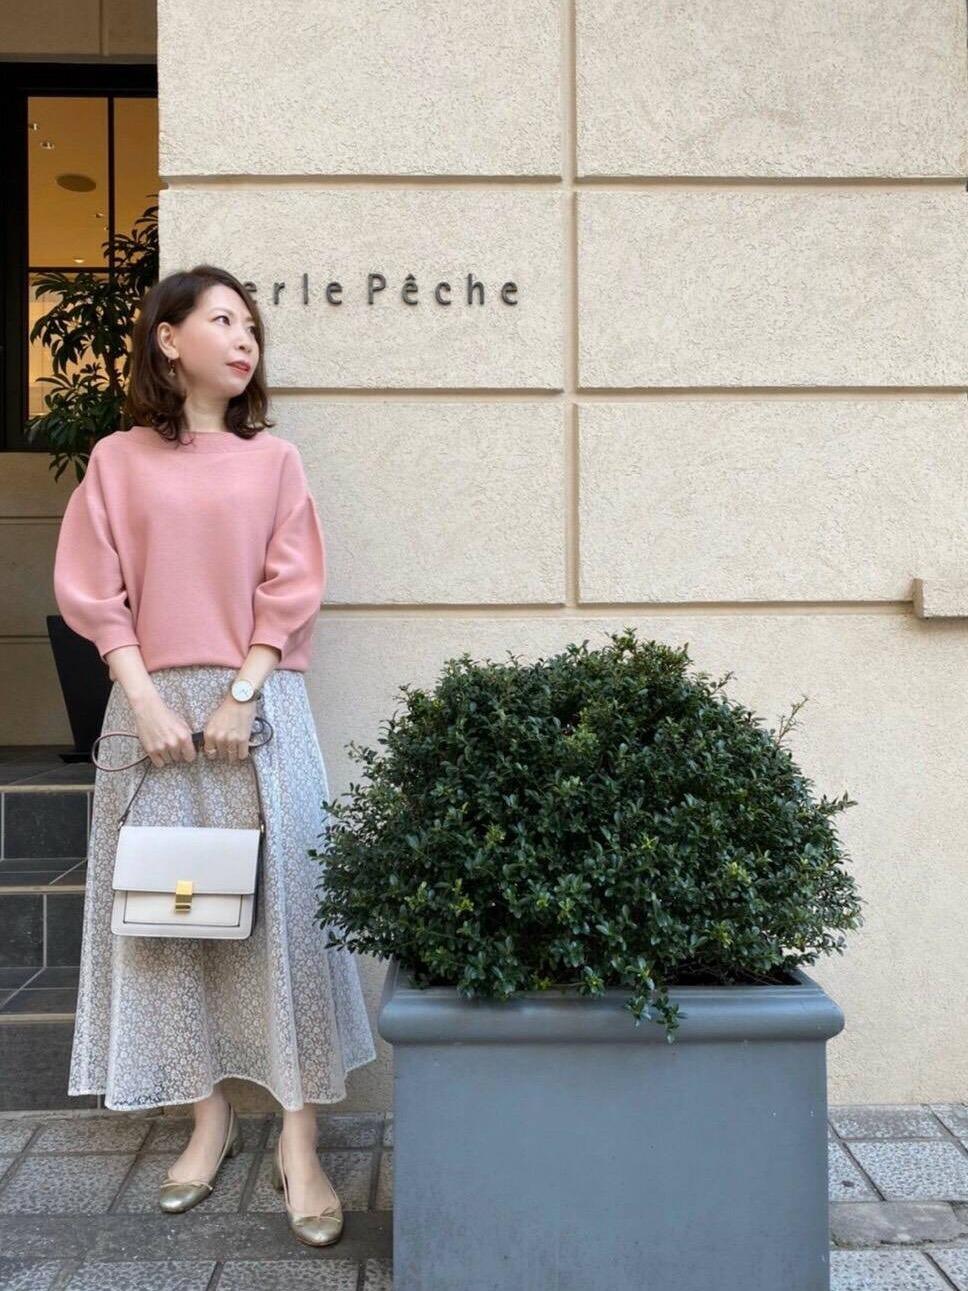 Perle Peche神戸旧居留地路面店